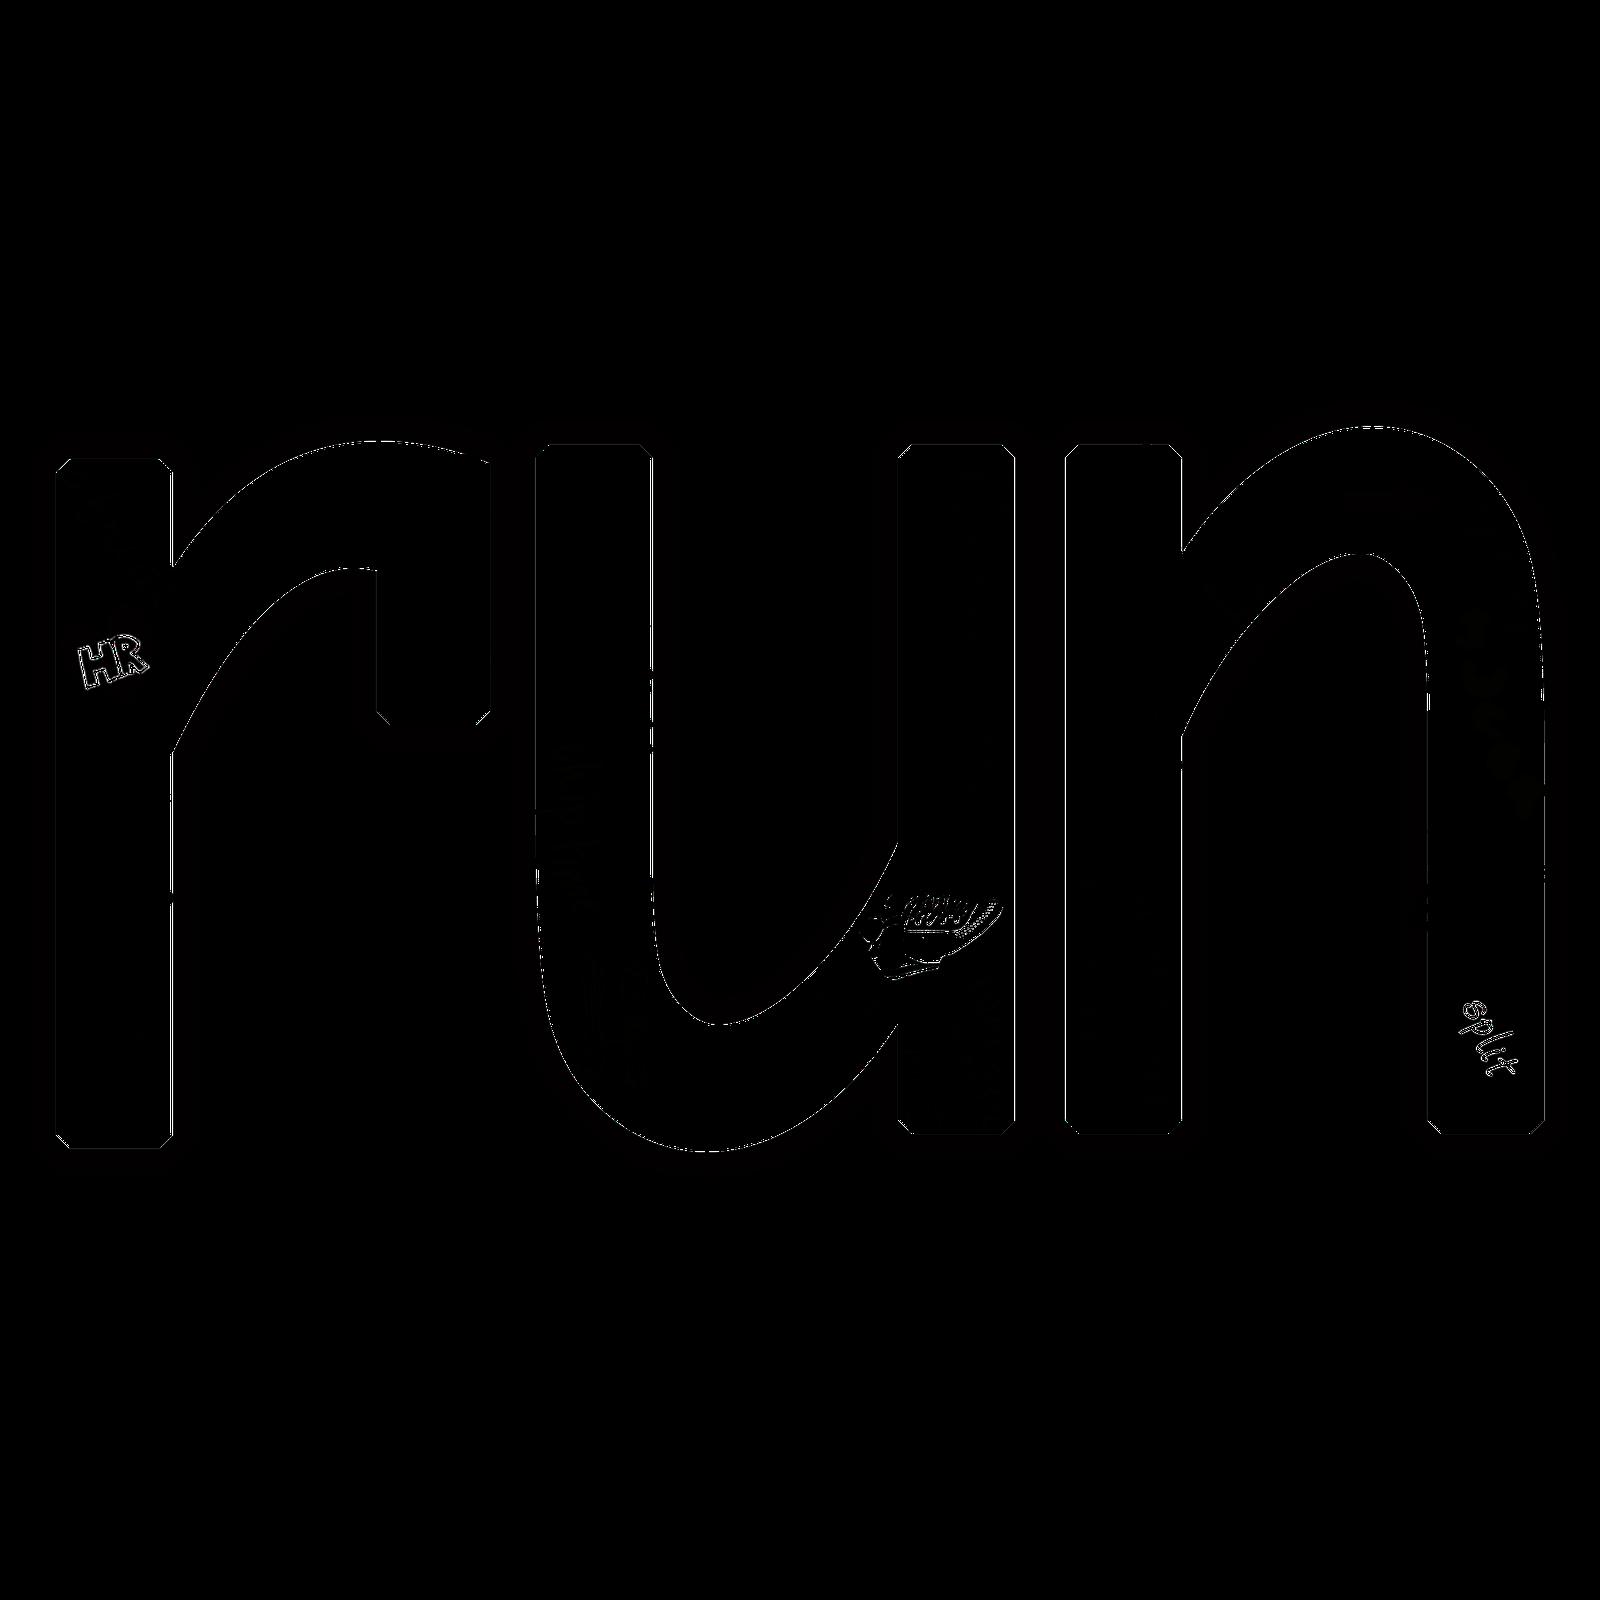 Run Collage 1 600 1 600 Pixels